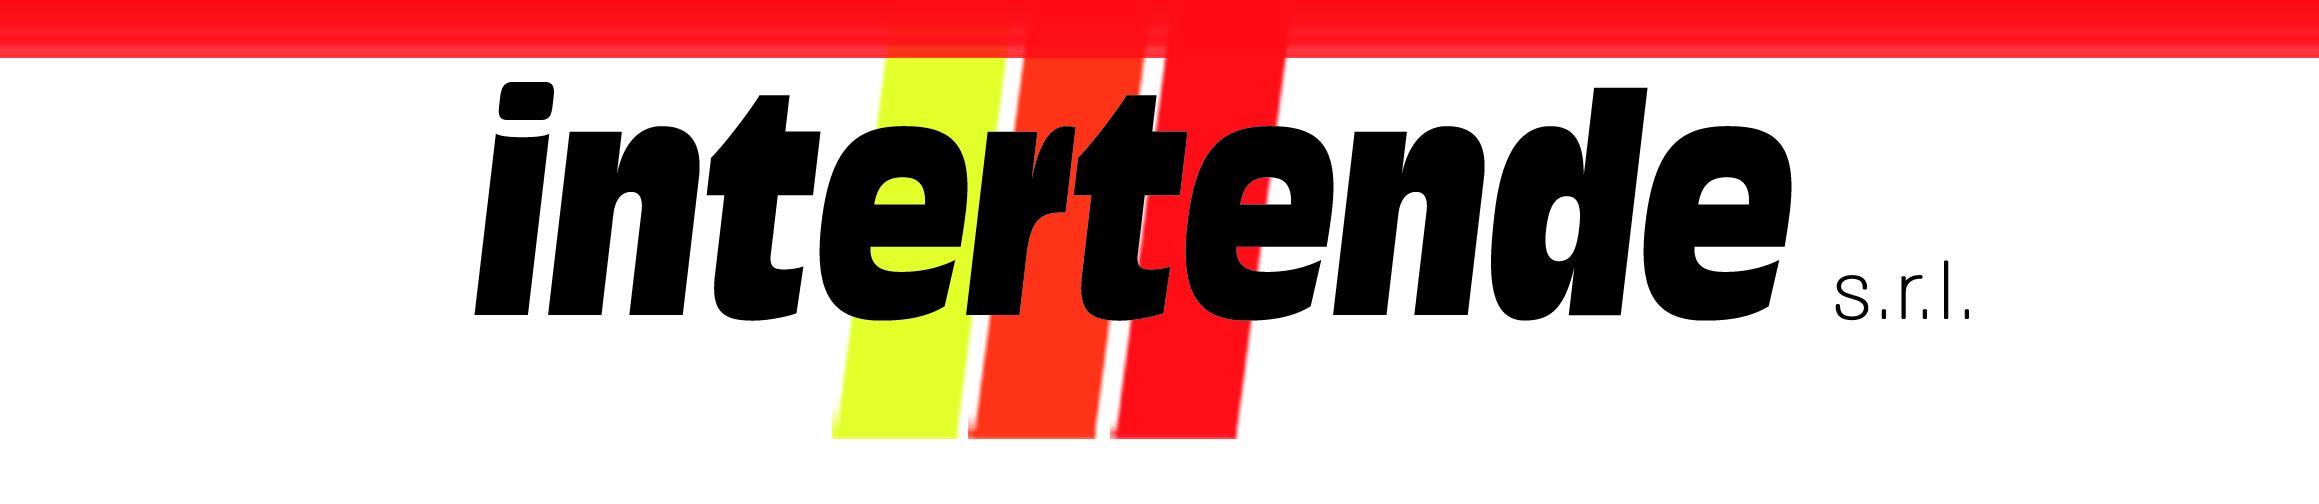 intertende logo jpeg